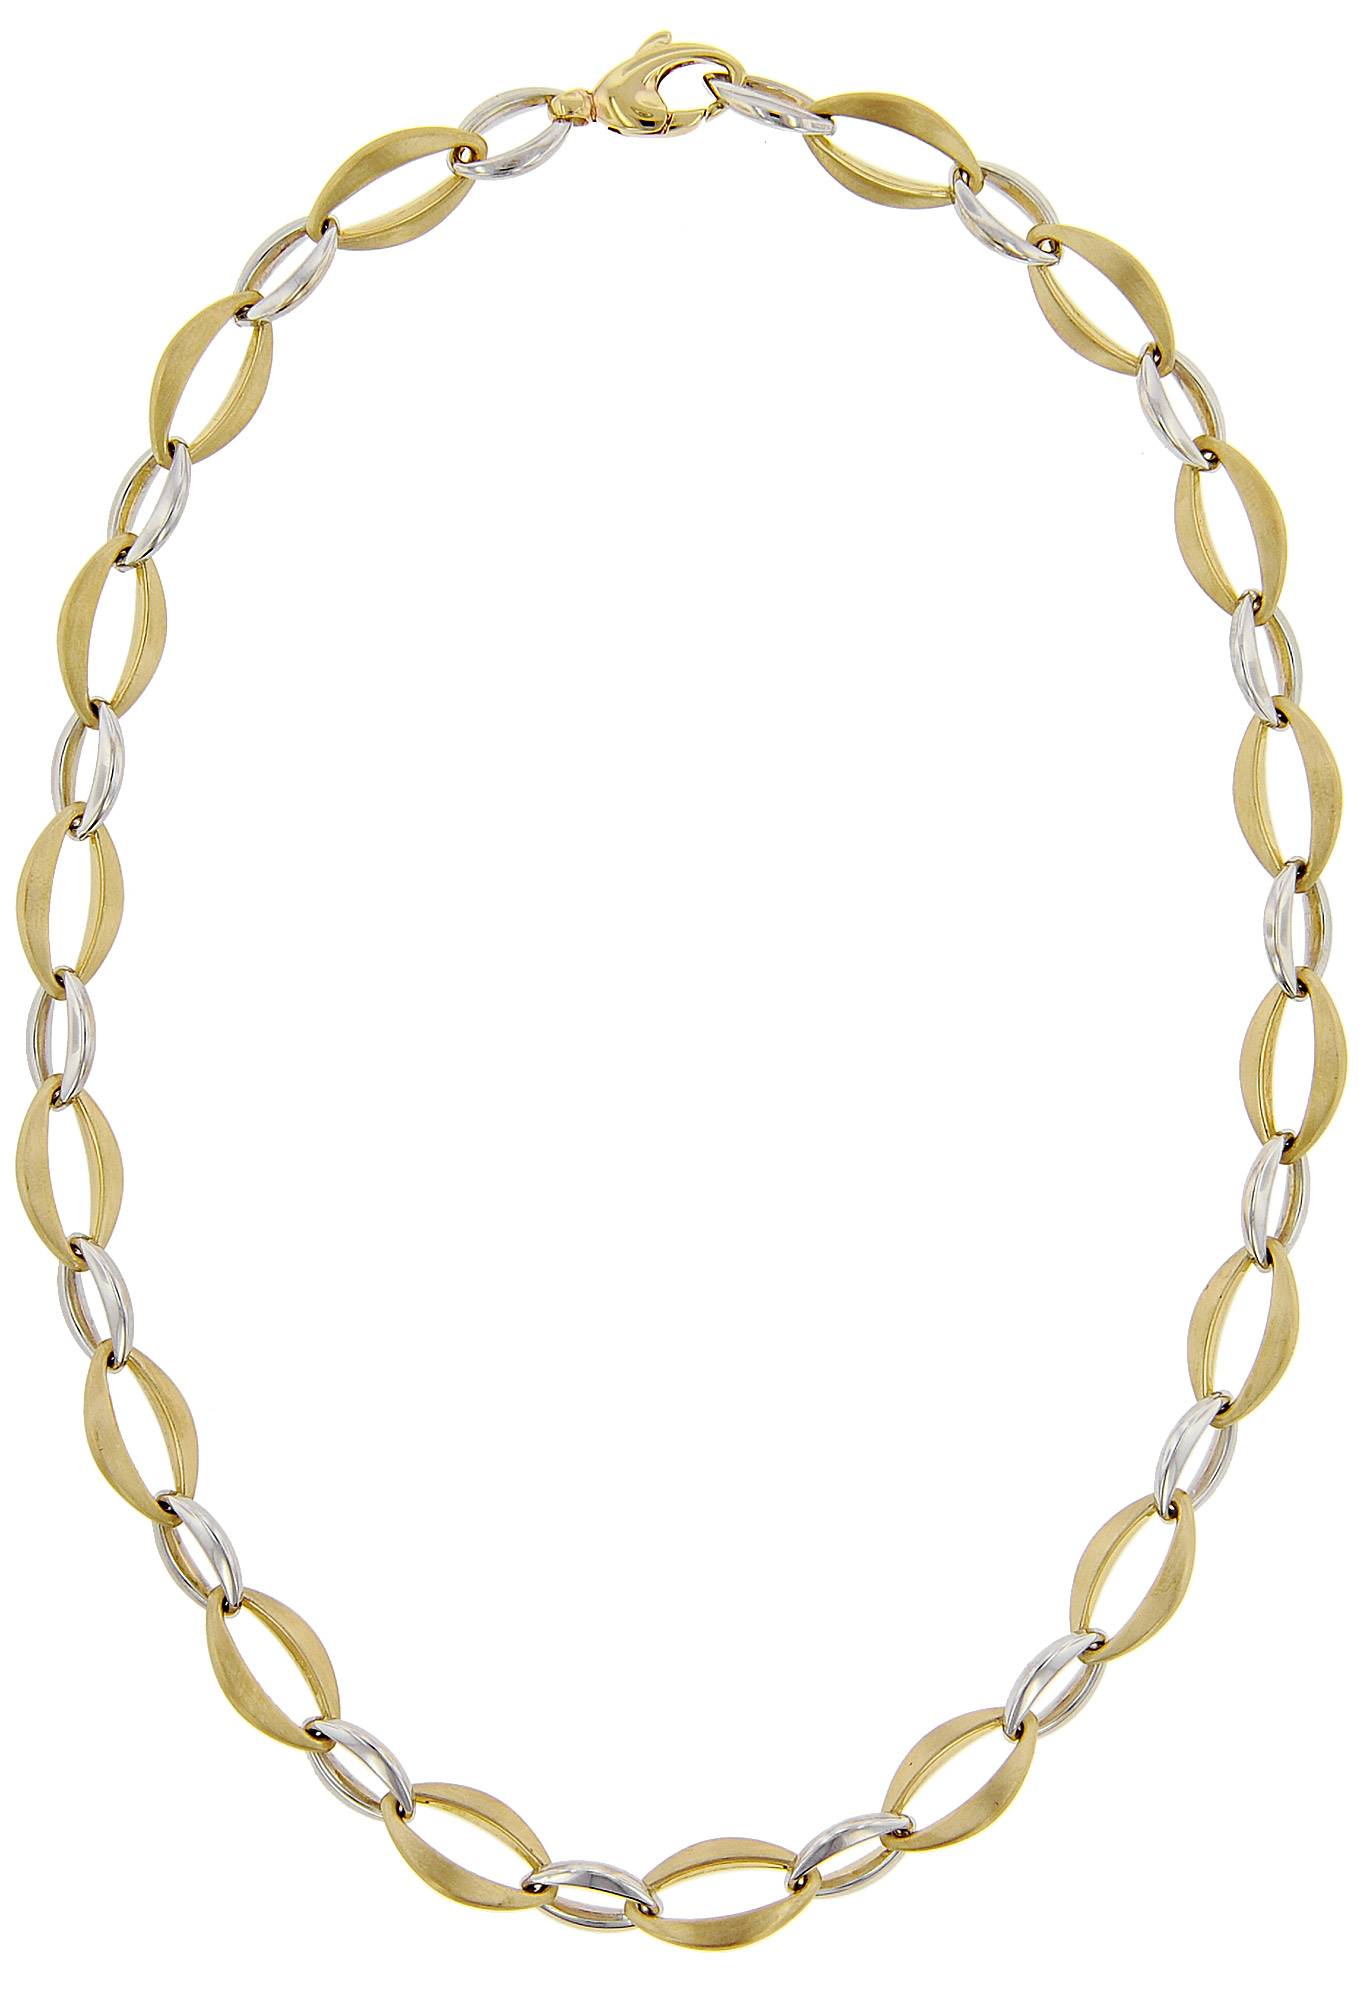 Elaine Firenze Schmuck 11111C Gold Damen-Halskette